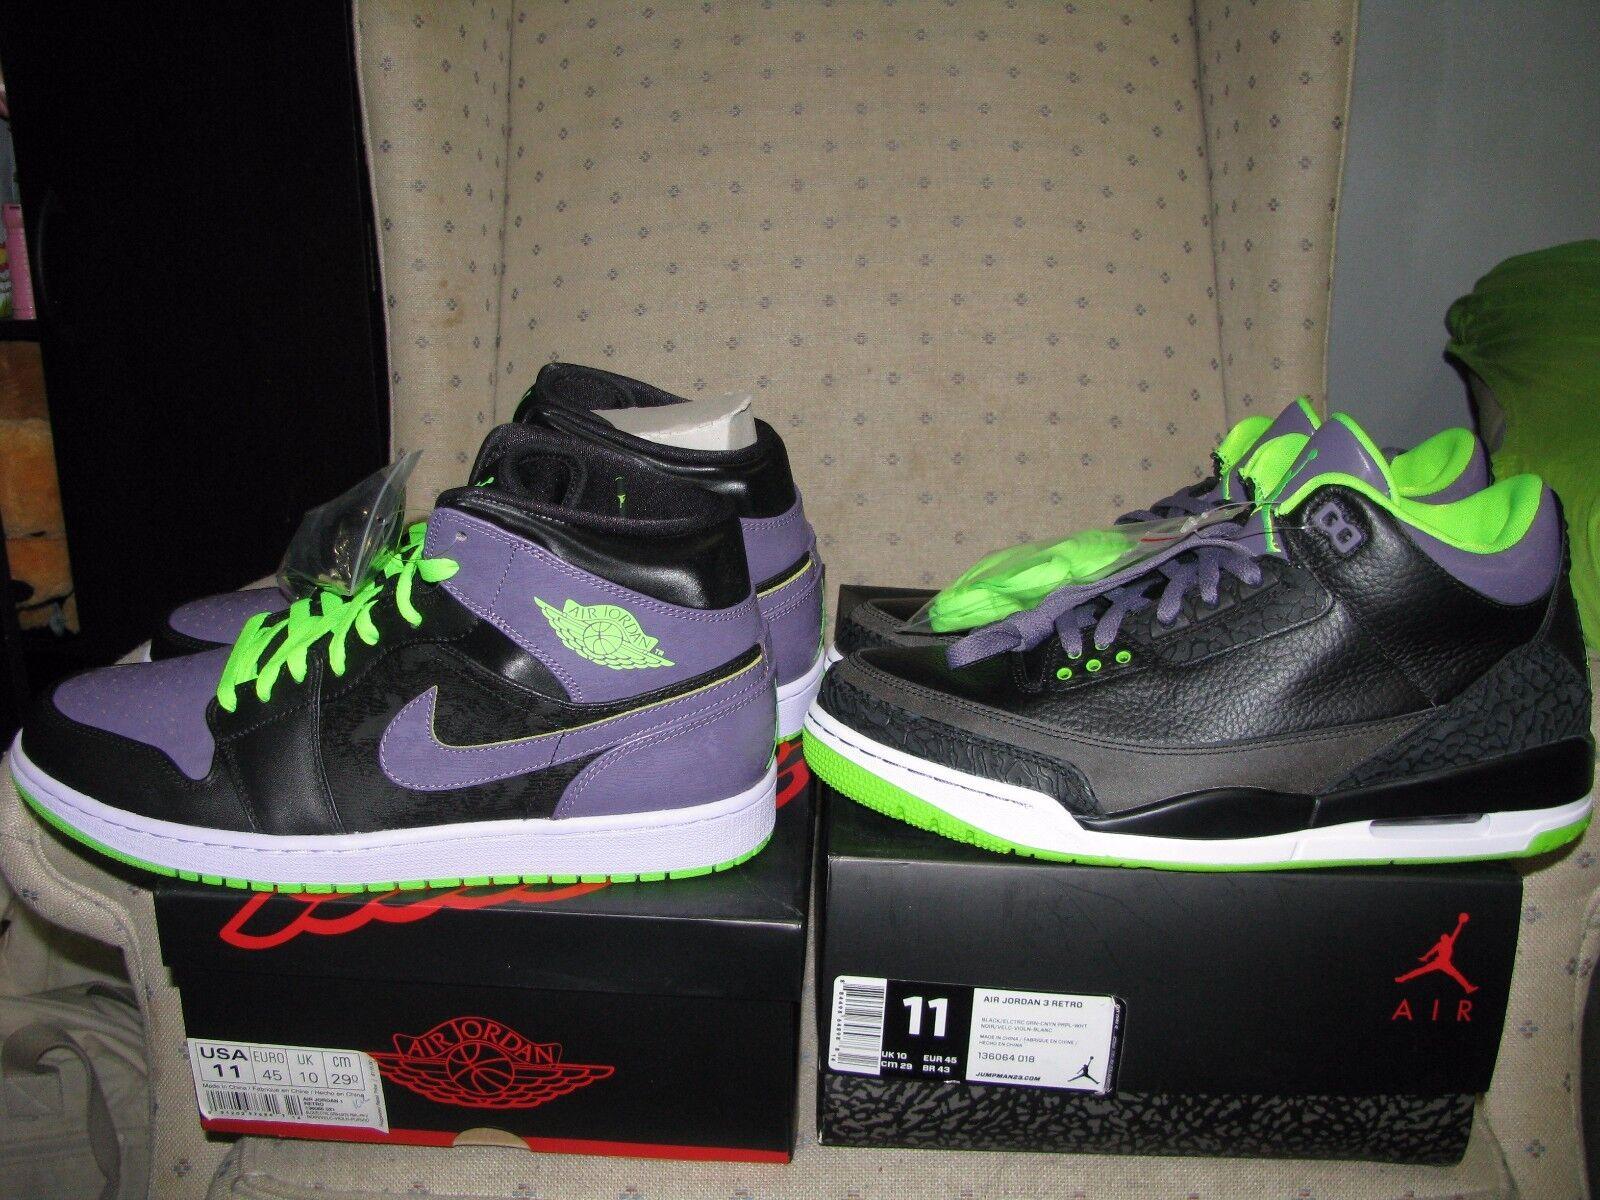 2 PAIRS NIKE AIR JORDAN RETRO 3 AND RETRO 1 JOKER Black purple green bred Sz 11